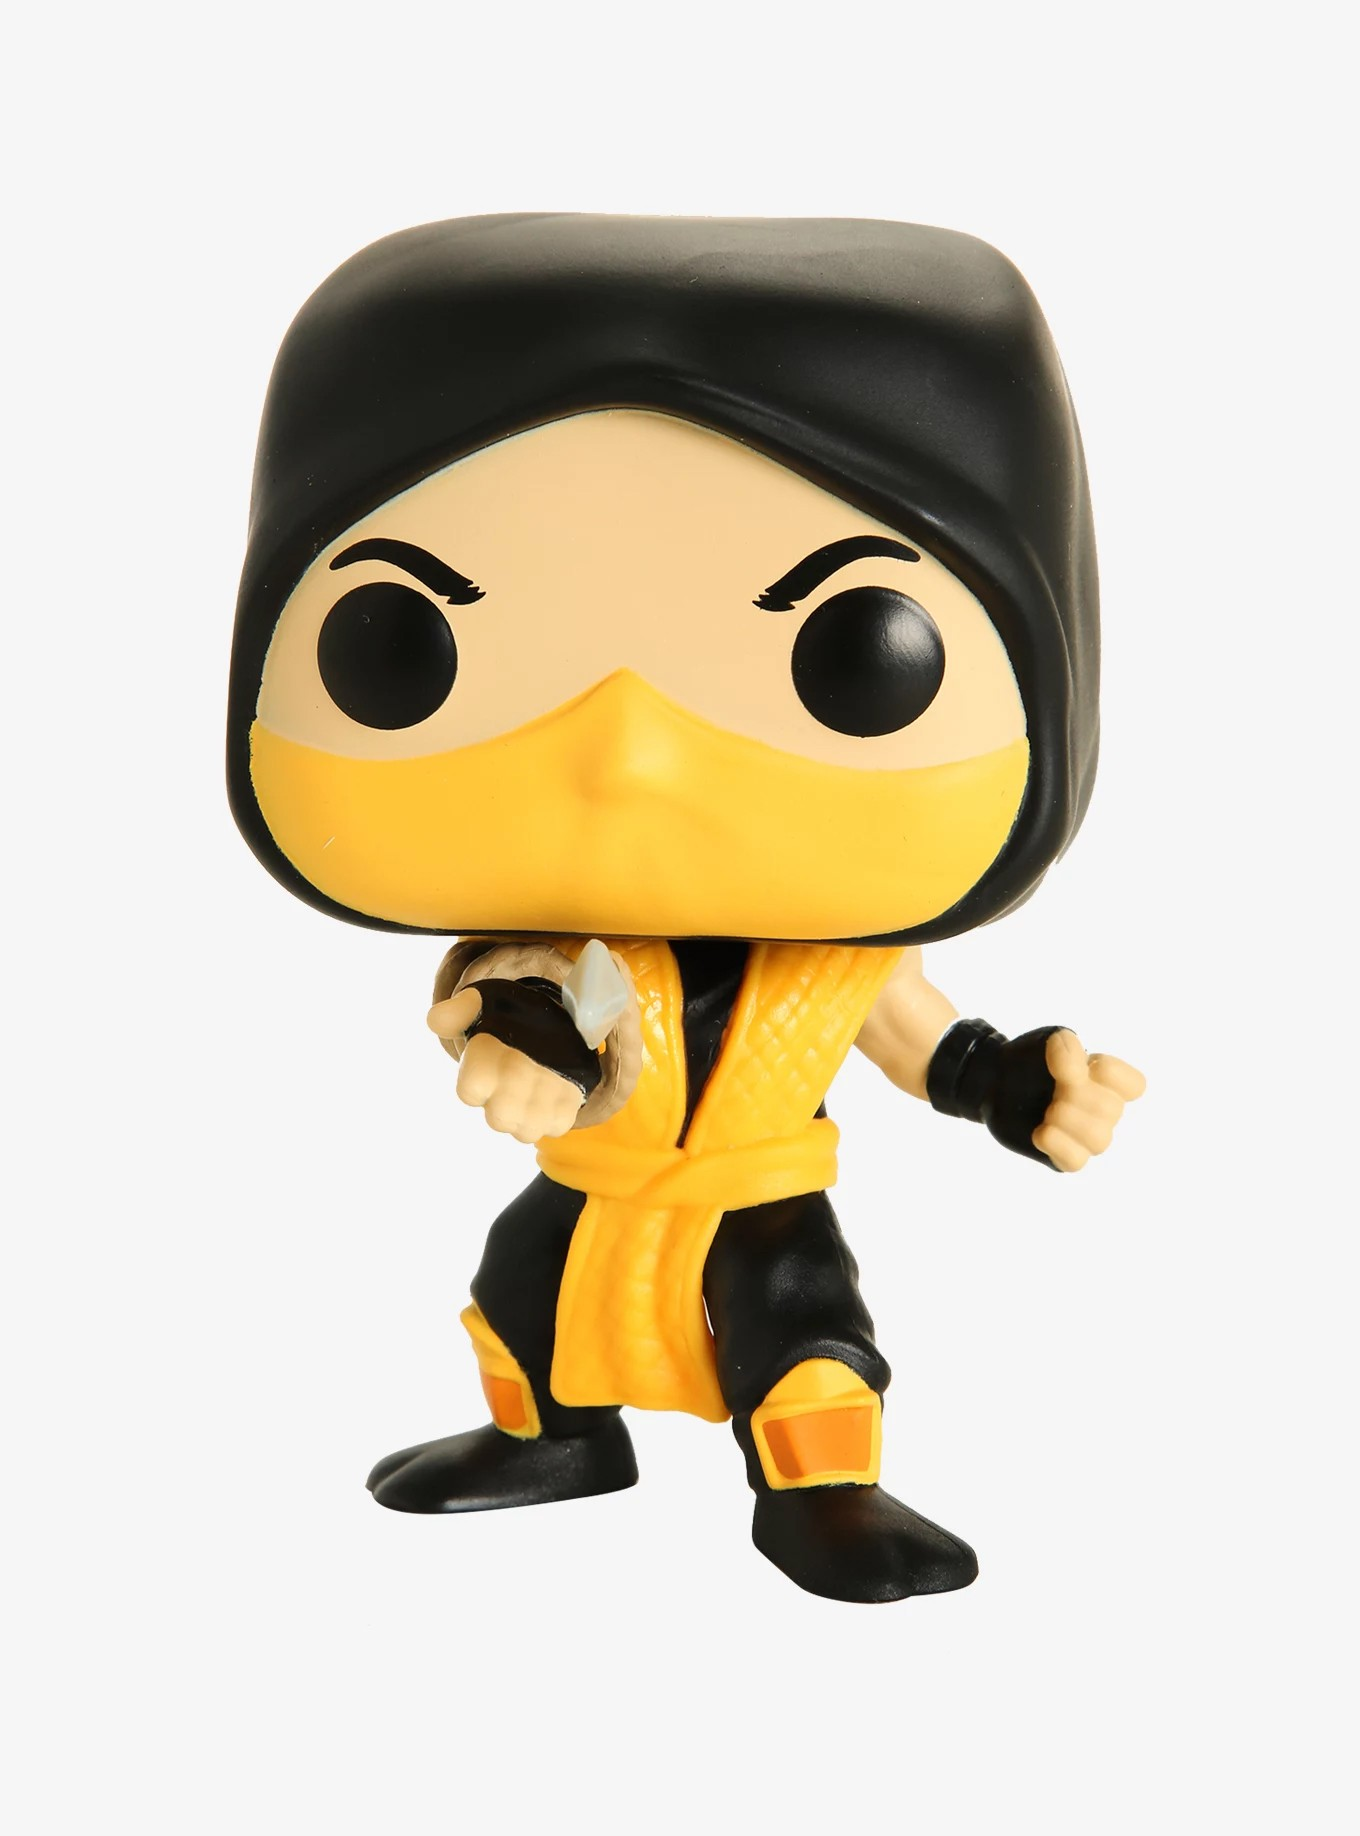 Scorpion #537 - Mortal Kombat - Funko Pop! Games